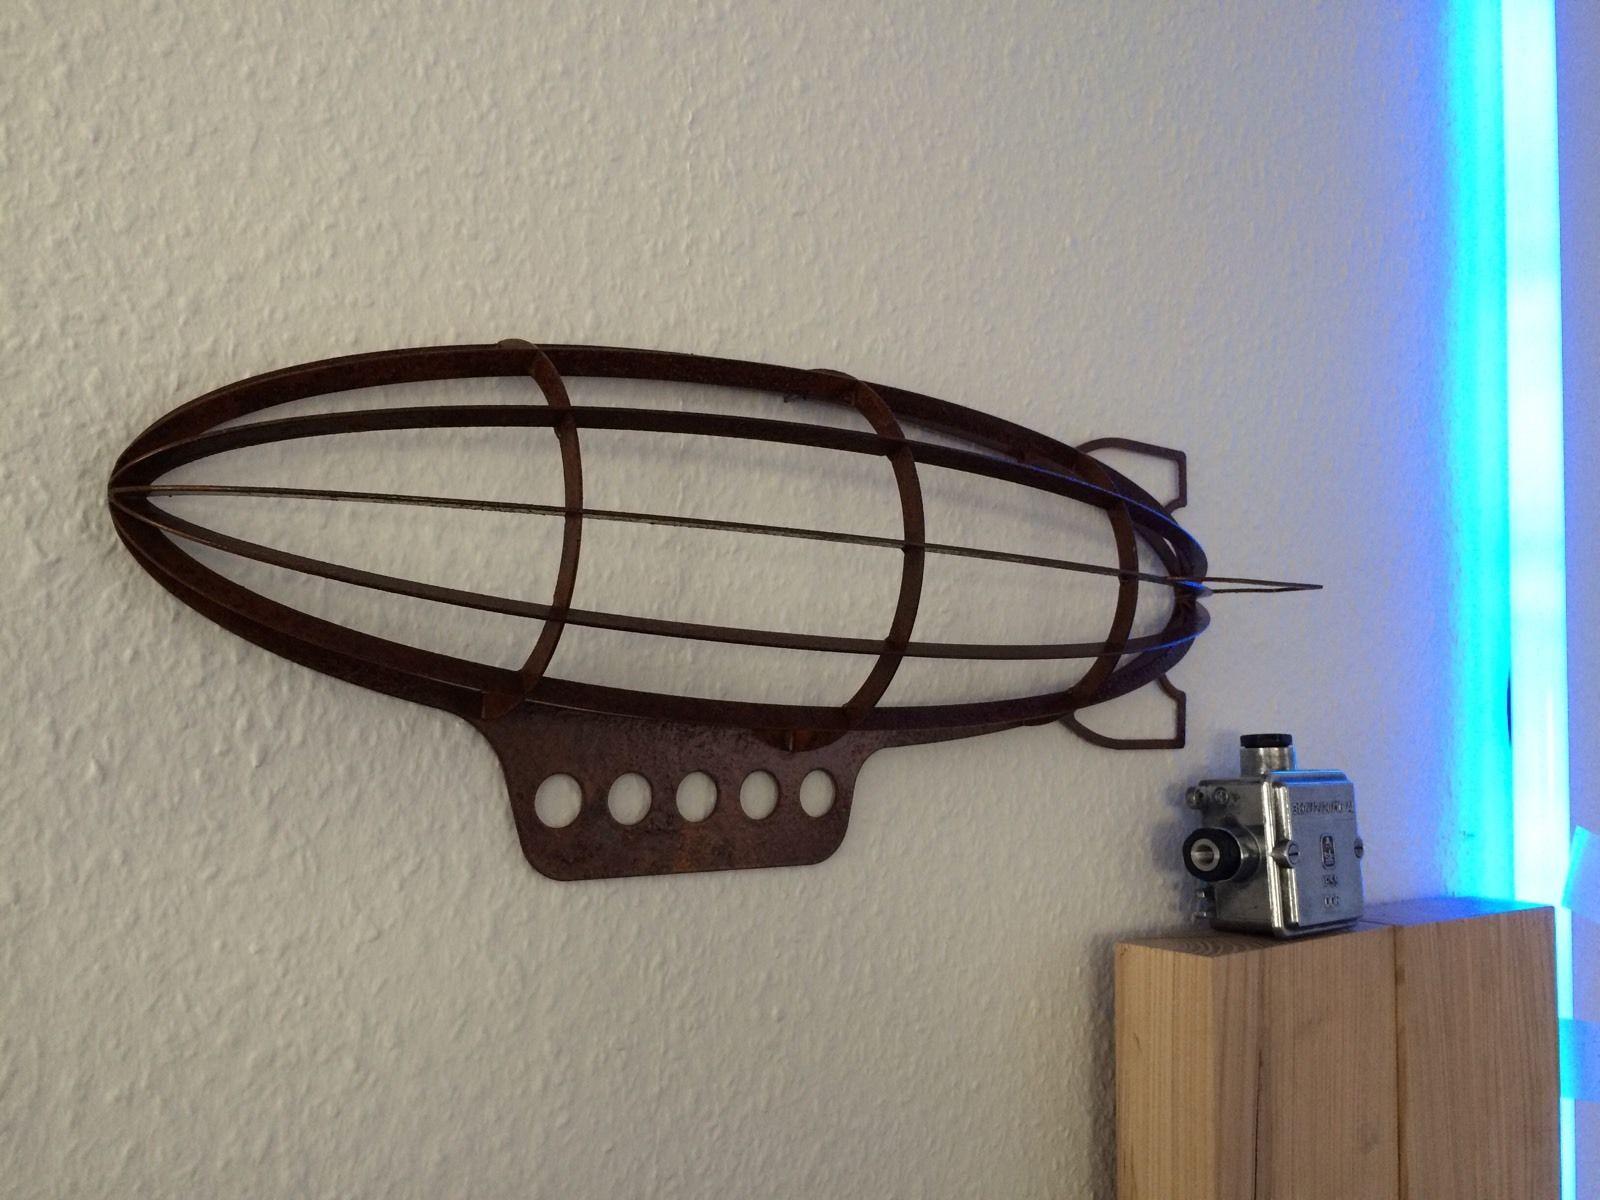 Steunk Deko luftschiff zeppelin steunk dekoration deko ebay handmade by